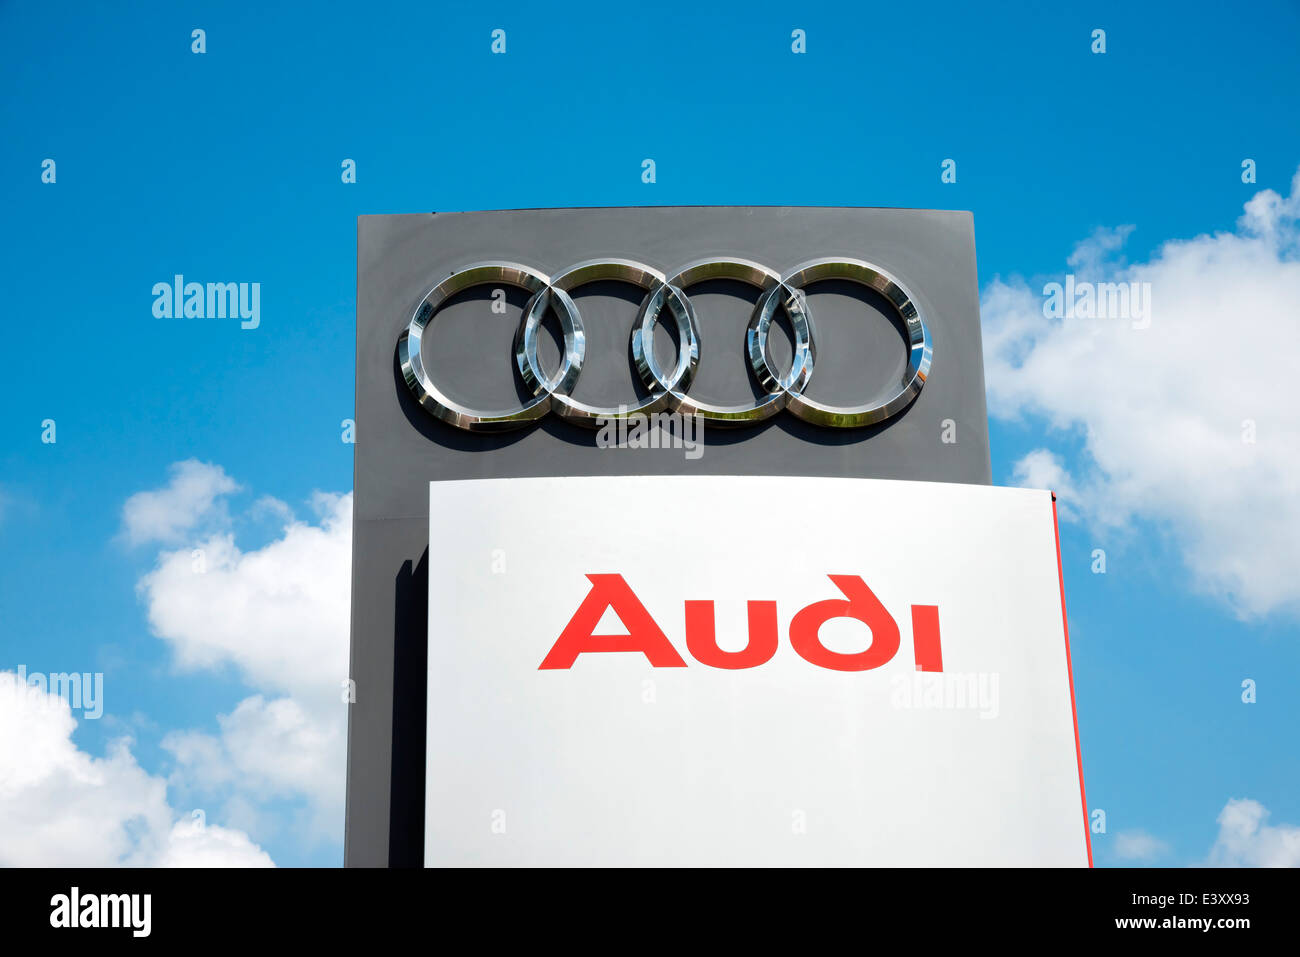 Audi car dealership sign, UK. - Stock Image